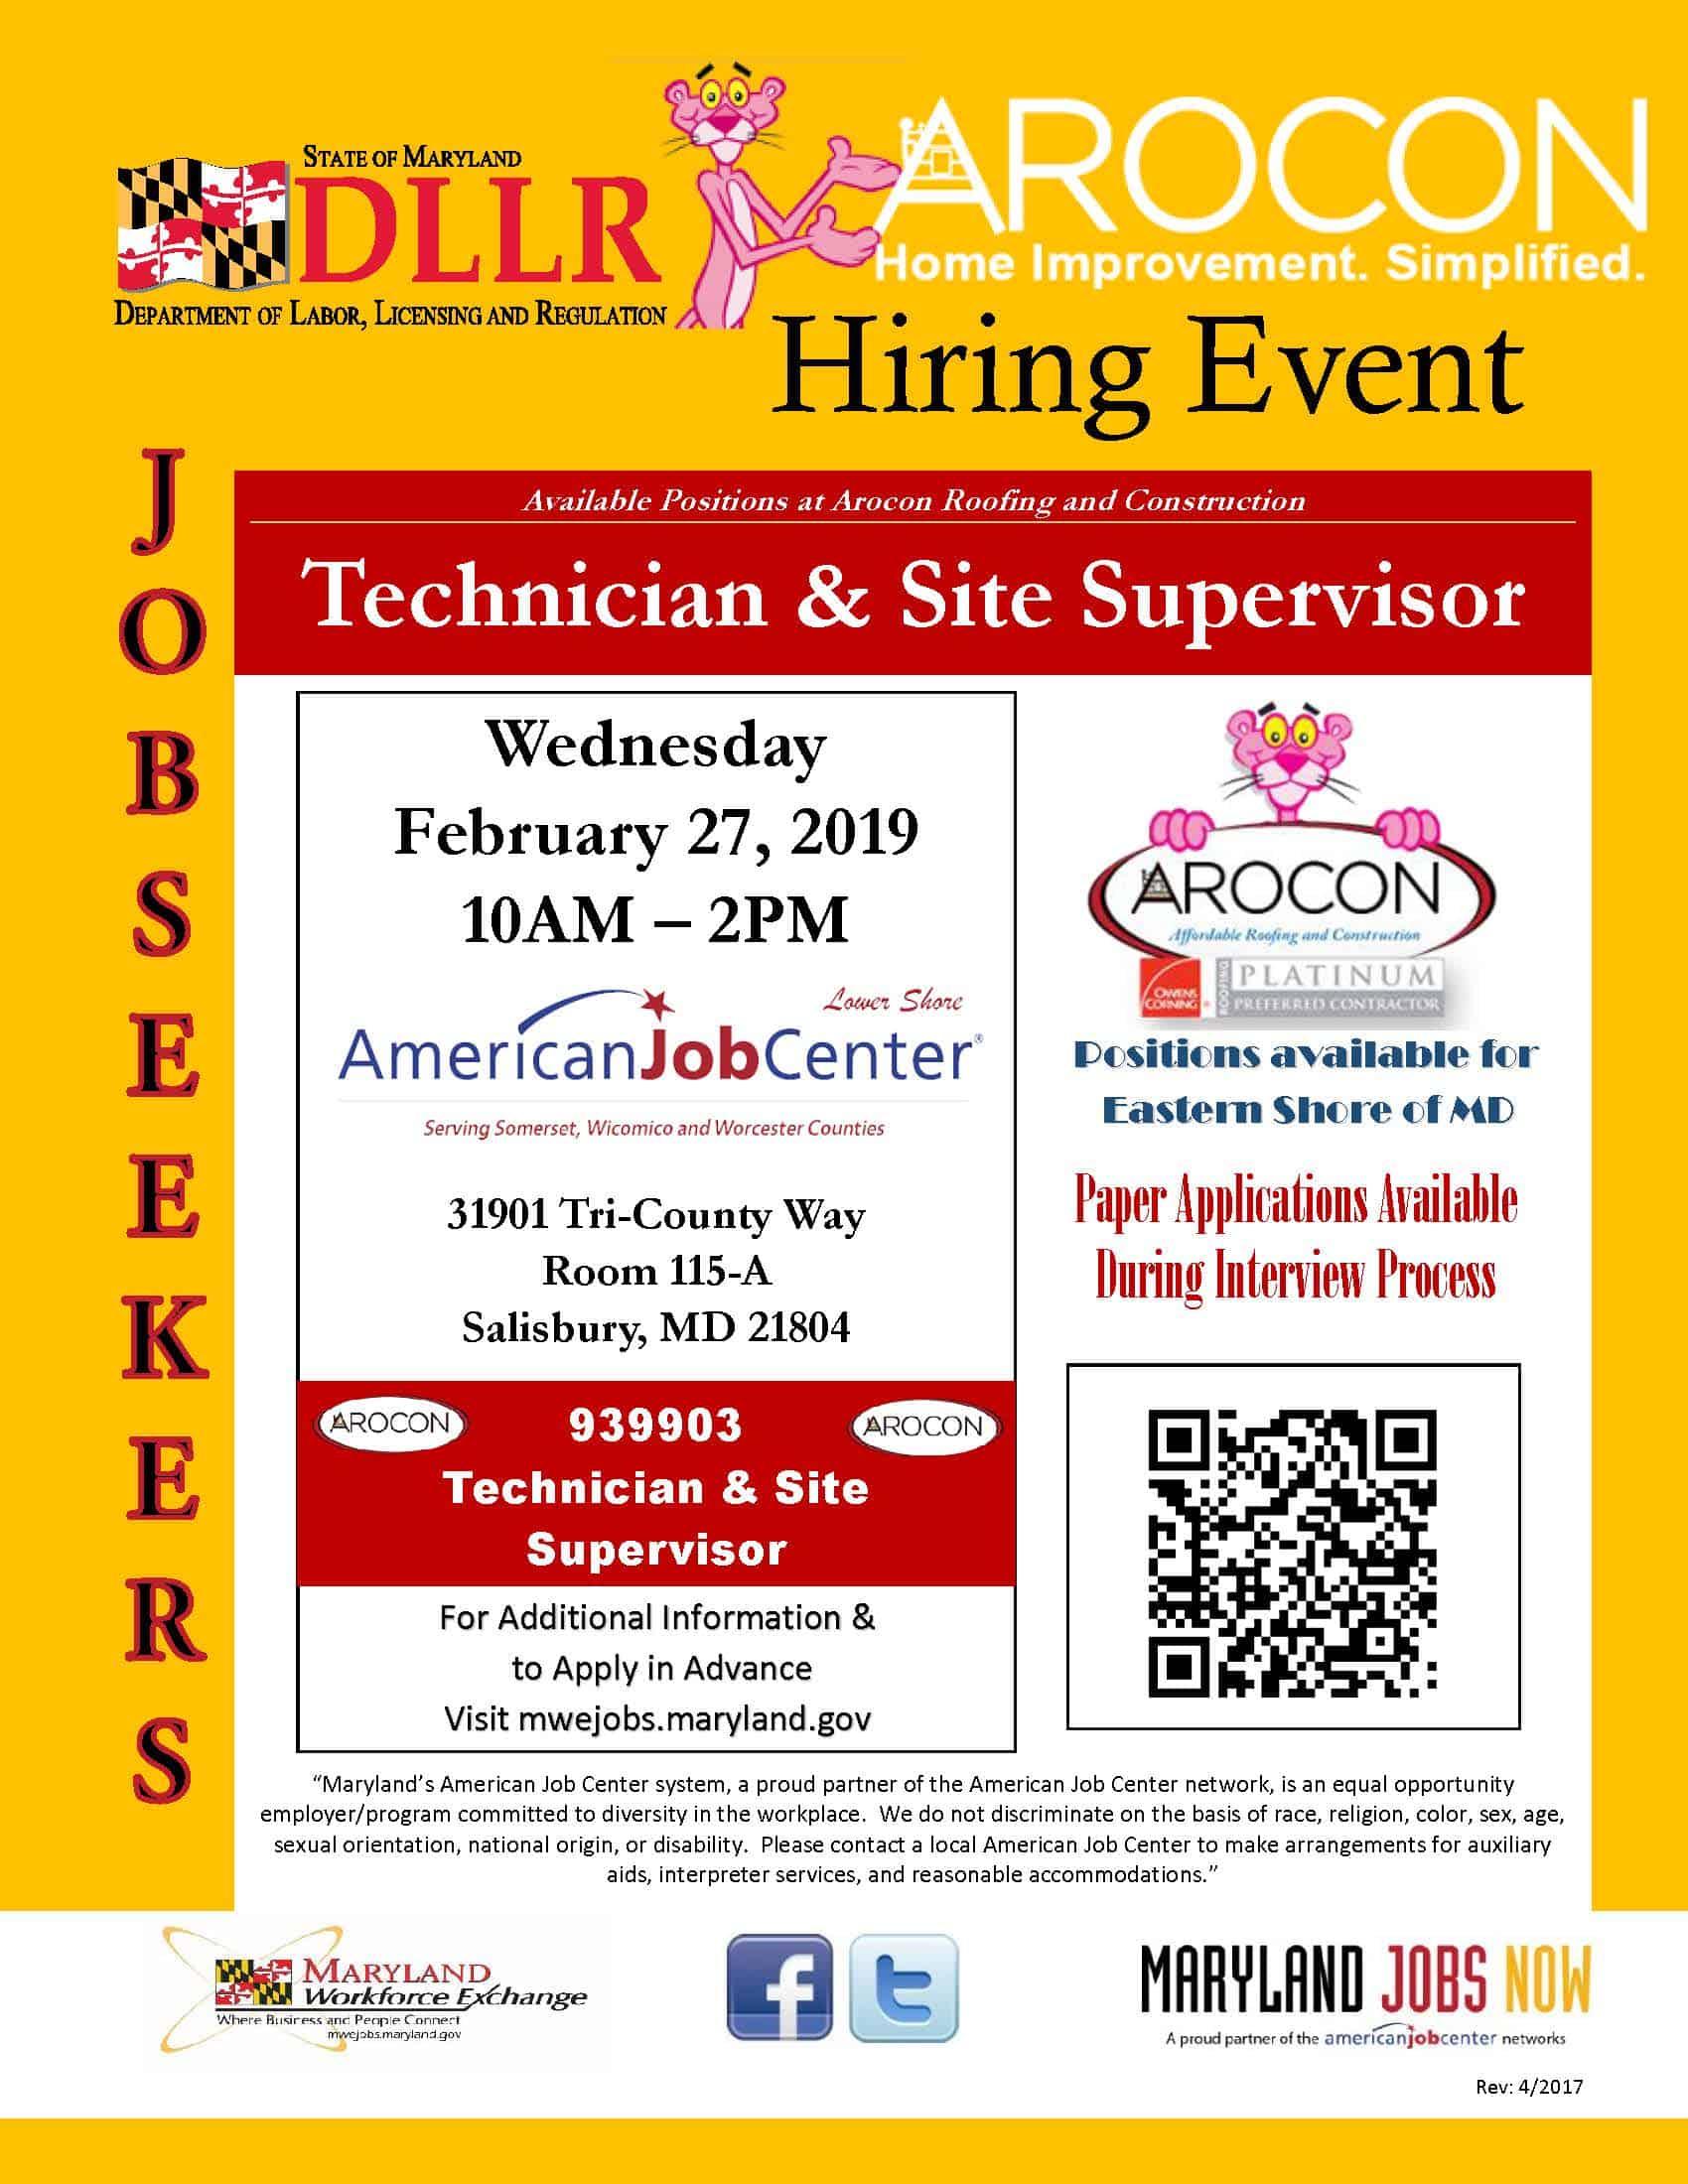 AROCON Hiring Event Flyer